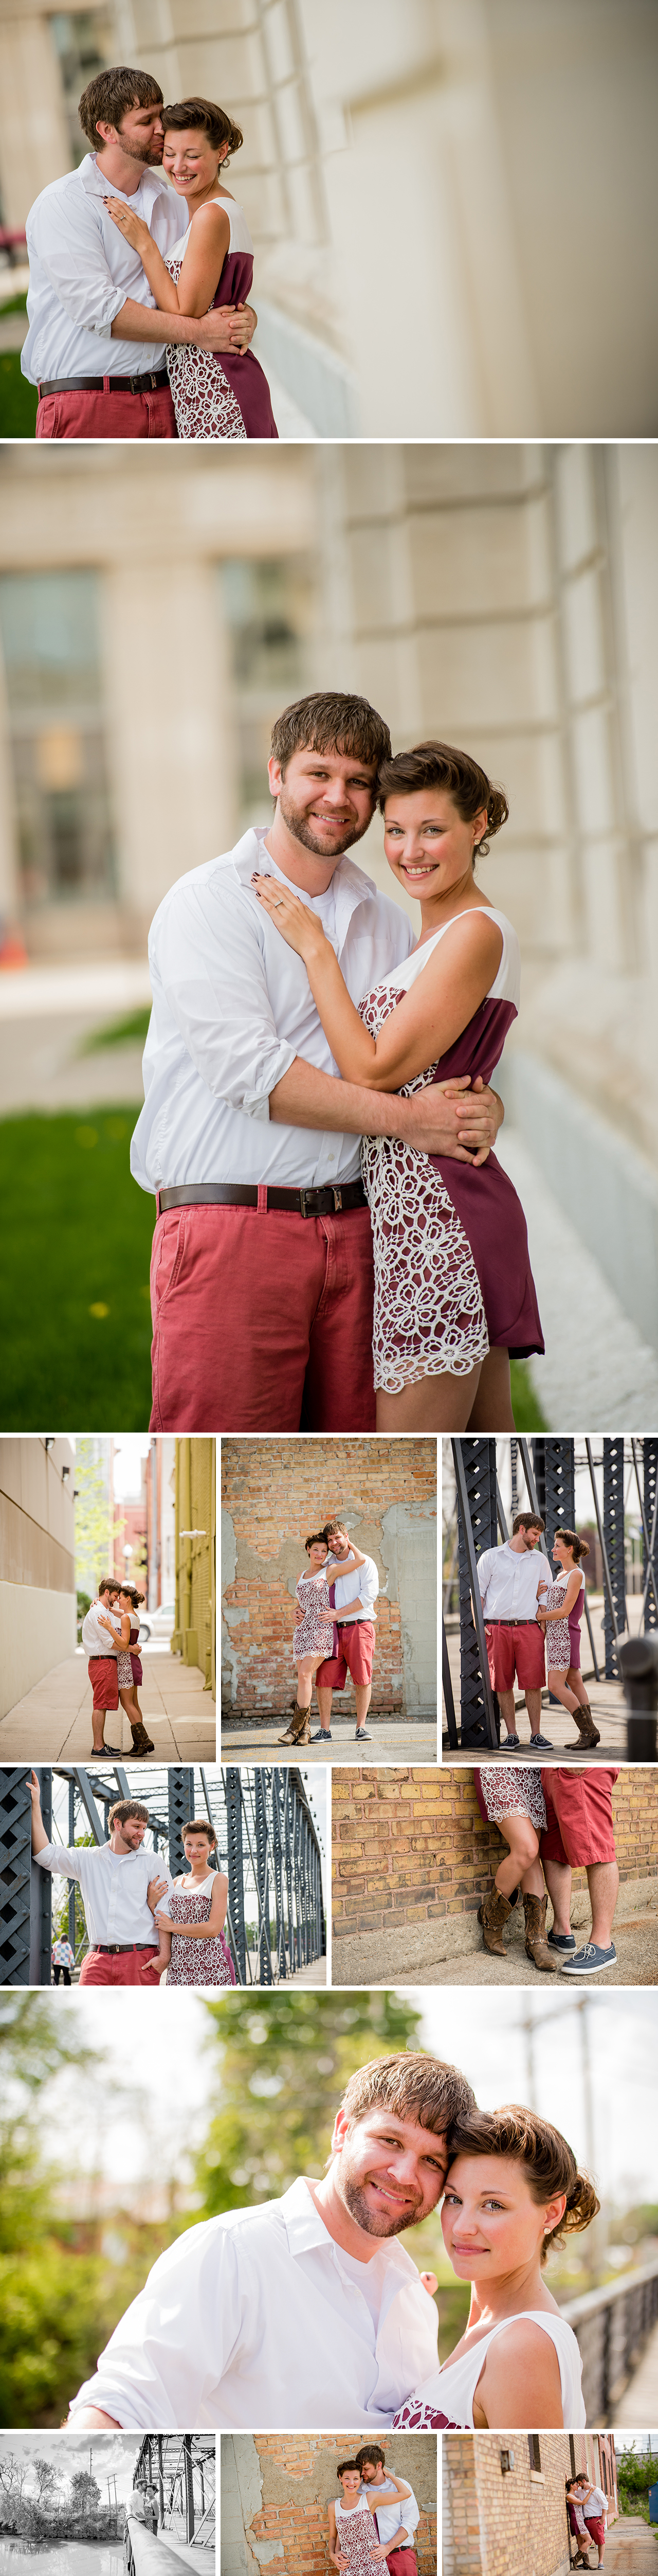 Fort Wayne Engagement Photographer